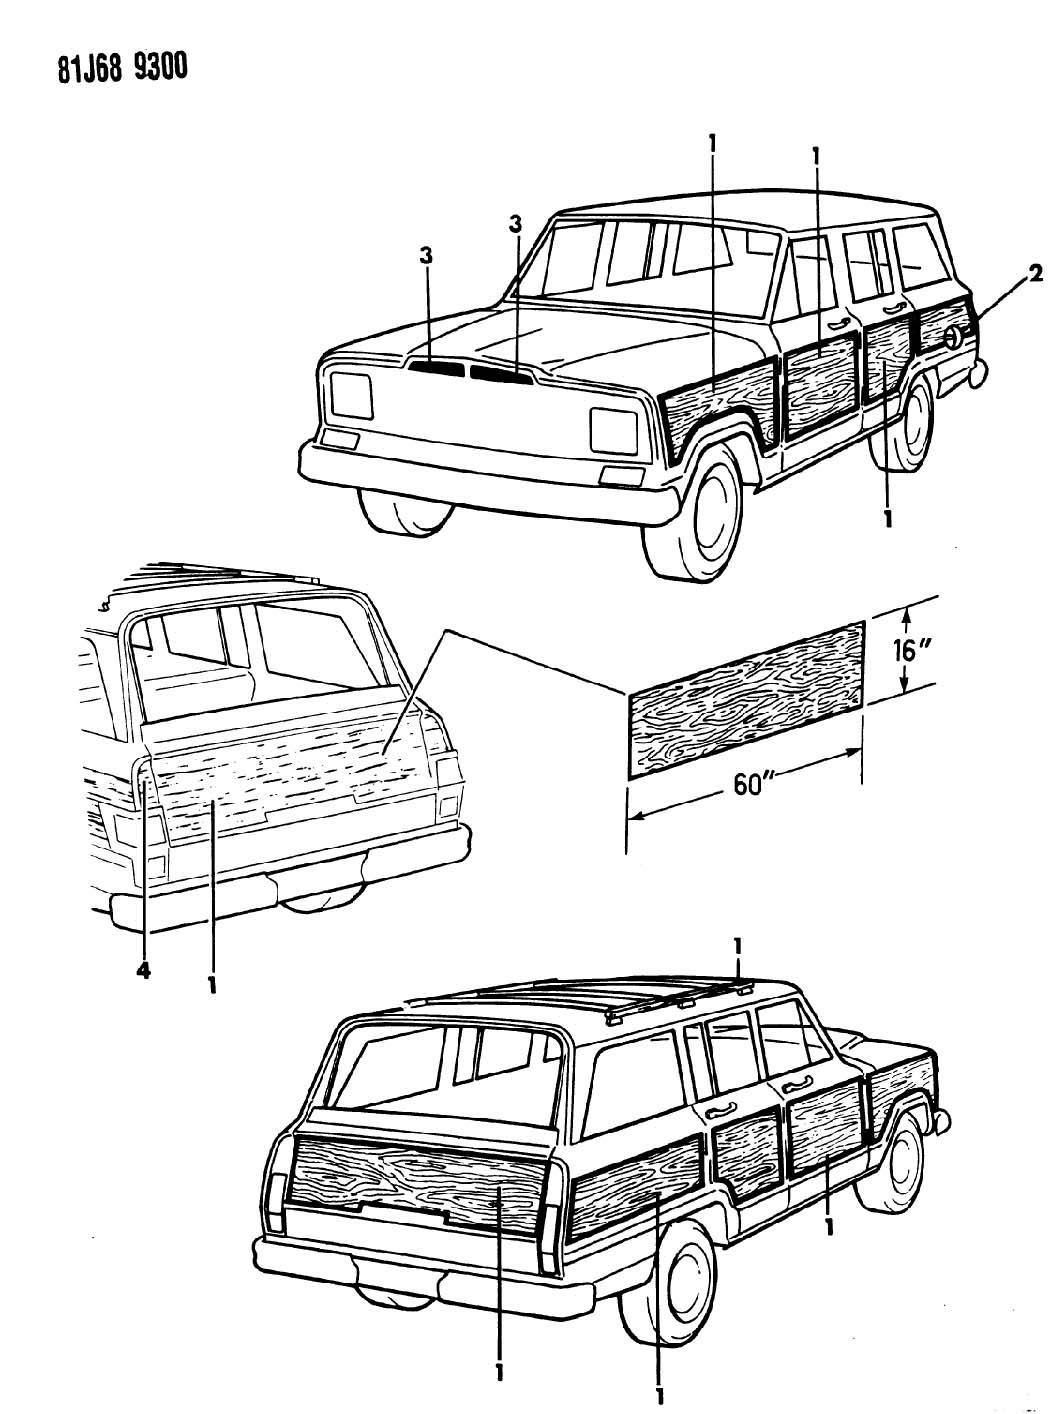 1985 Jeep Grand Wagoneer DECALS, EXTERIOR WOODGRAIN SJ